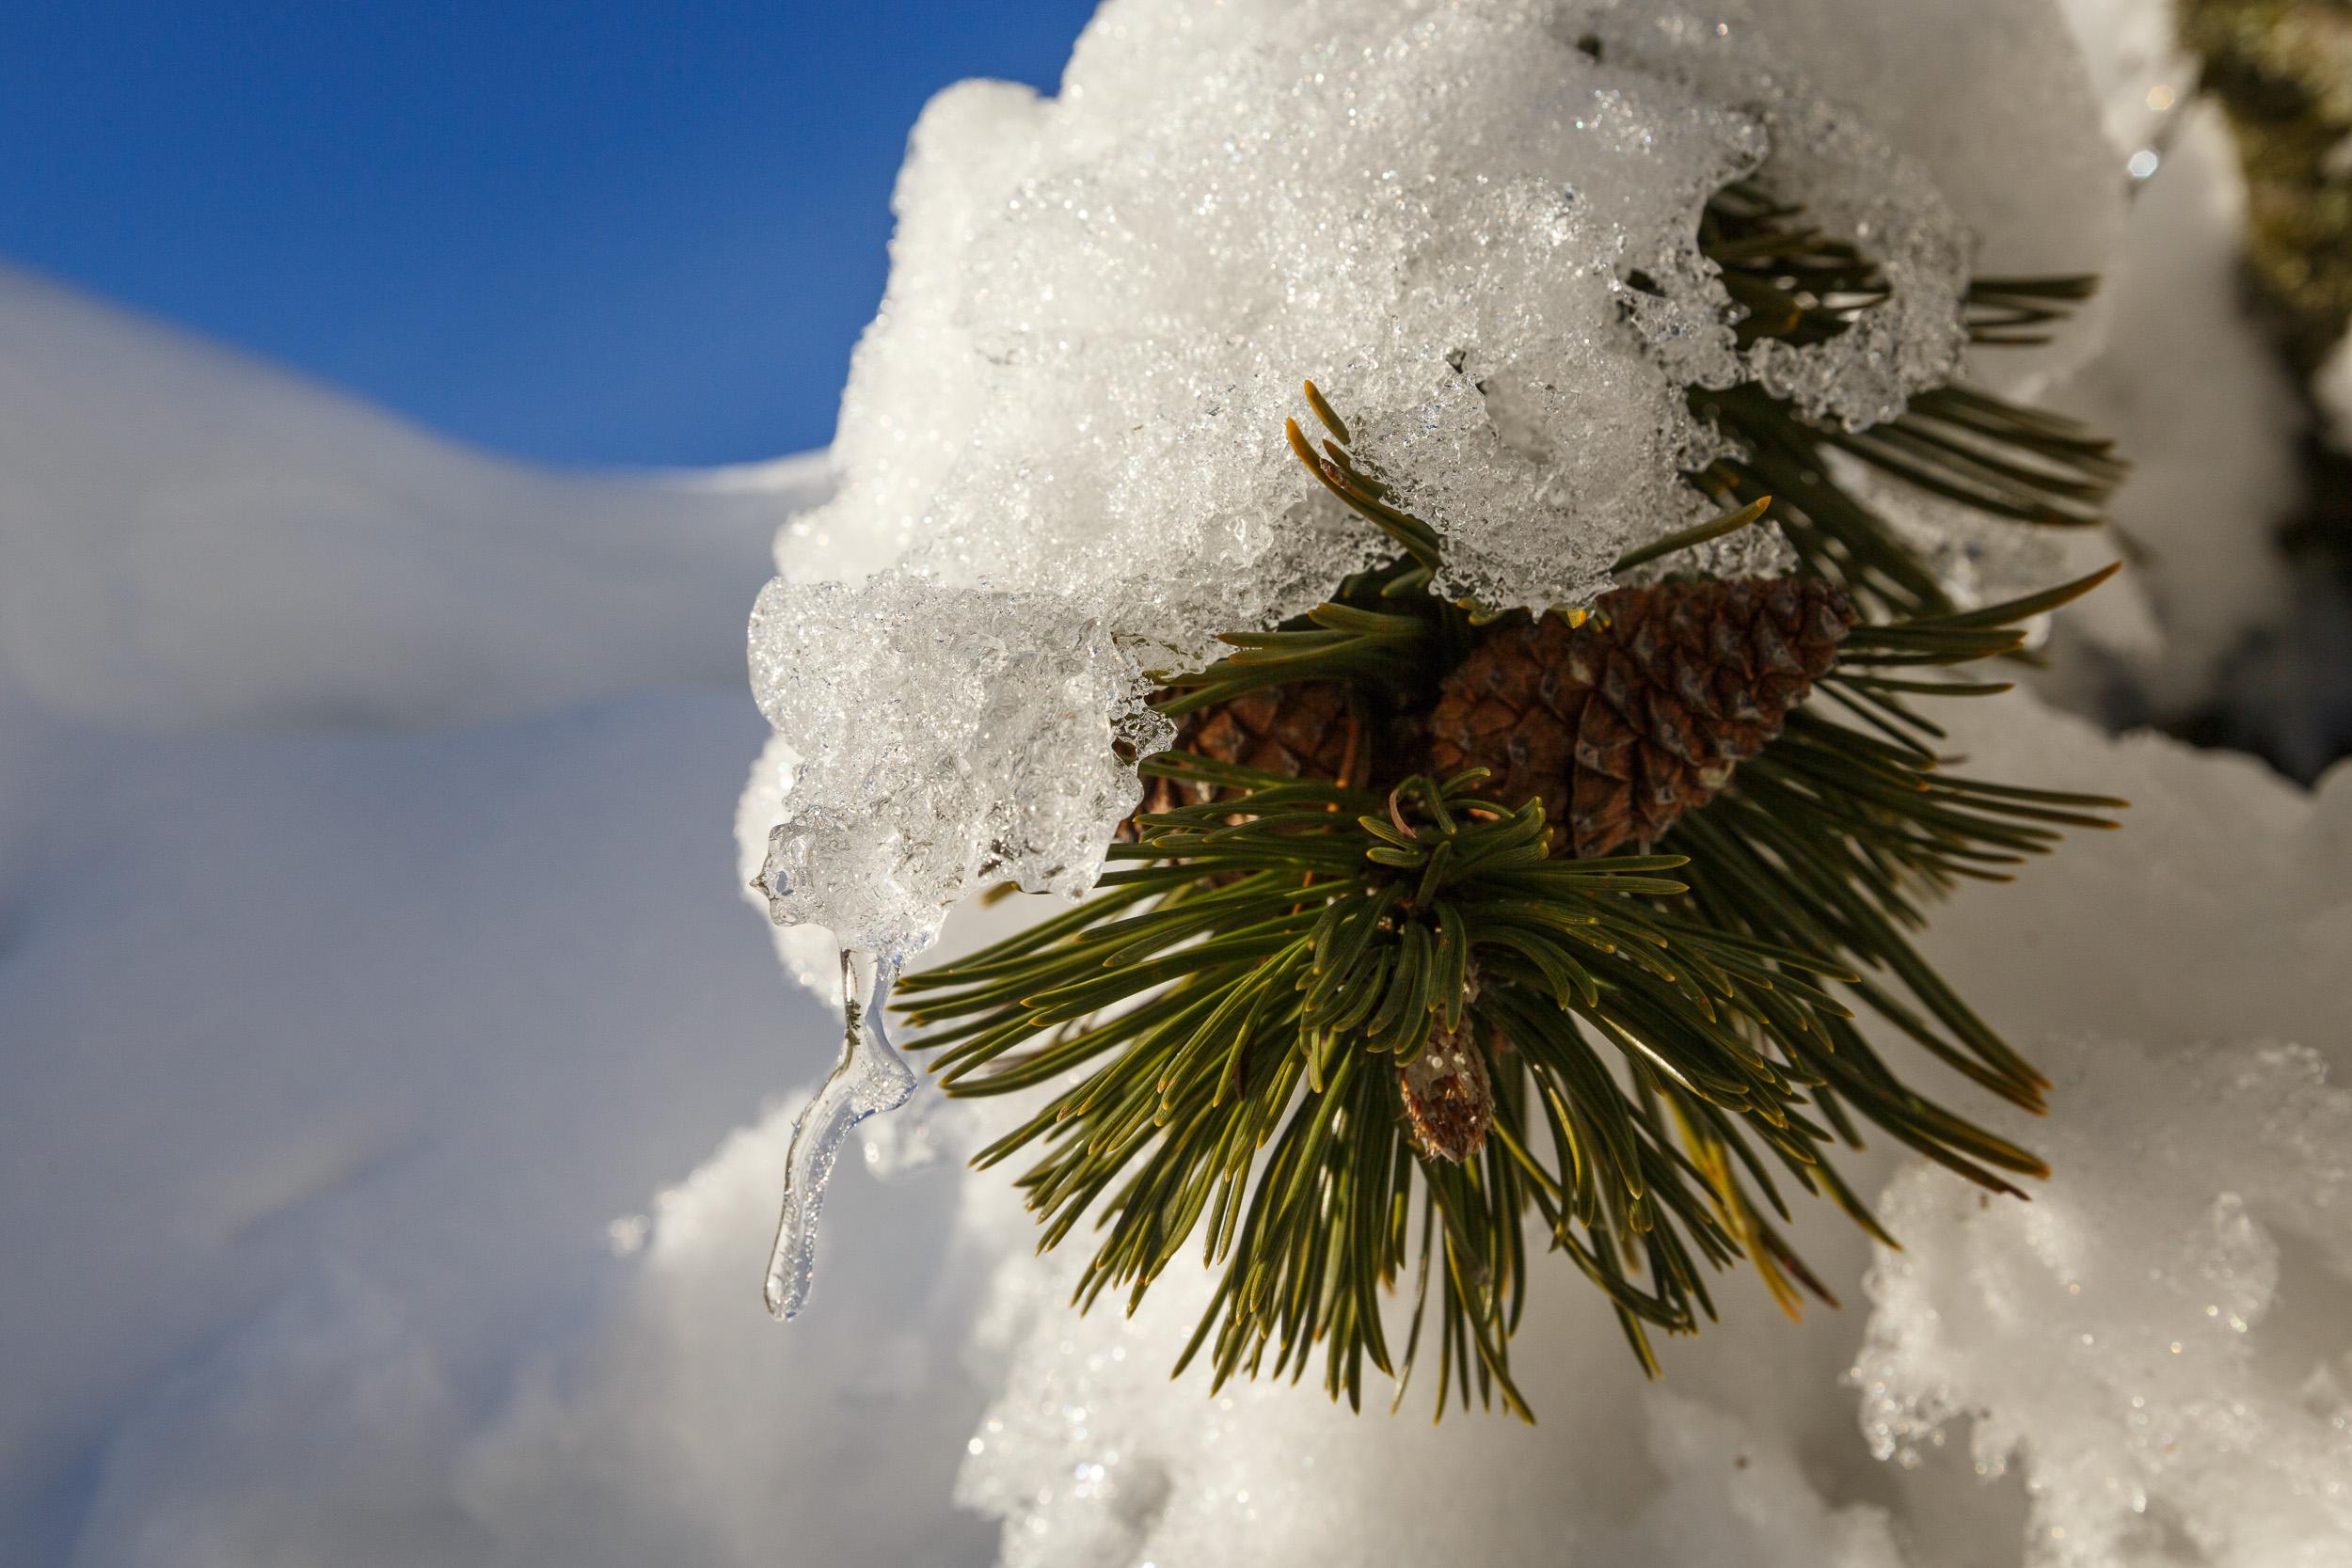 150213_winter_galerie_08.jpg